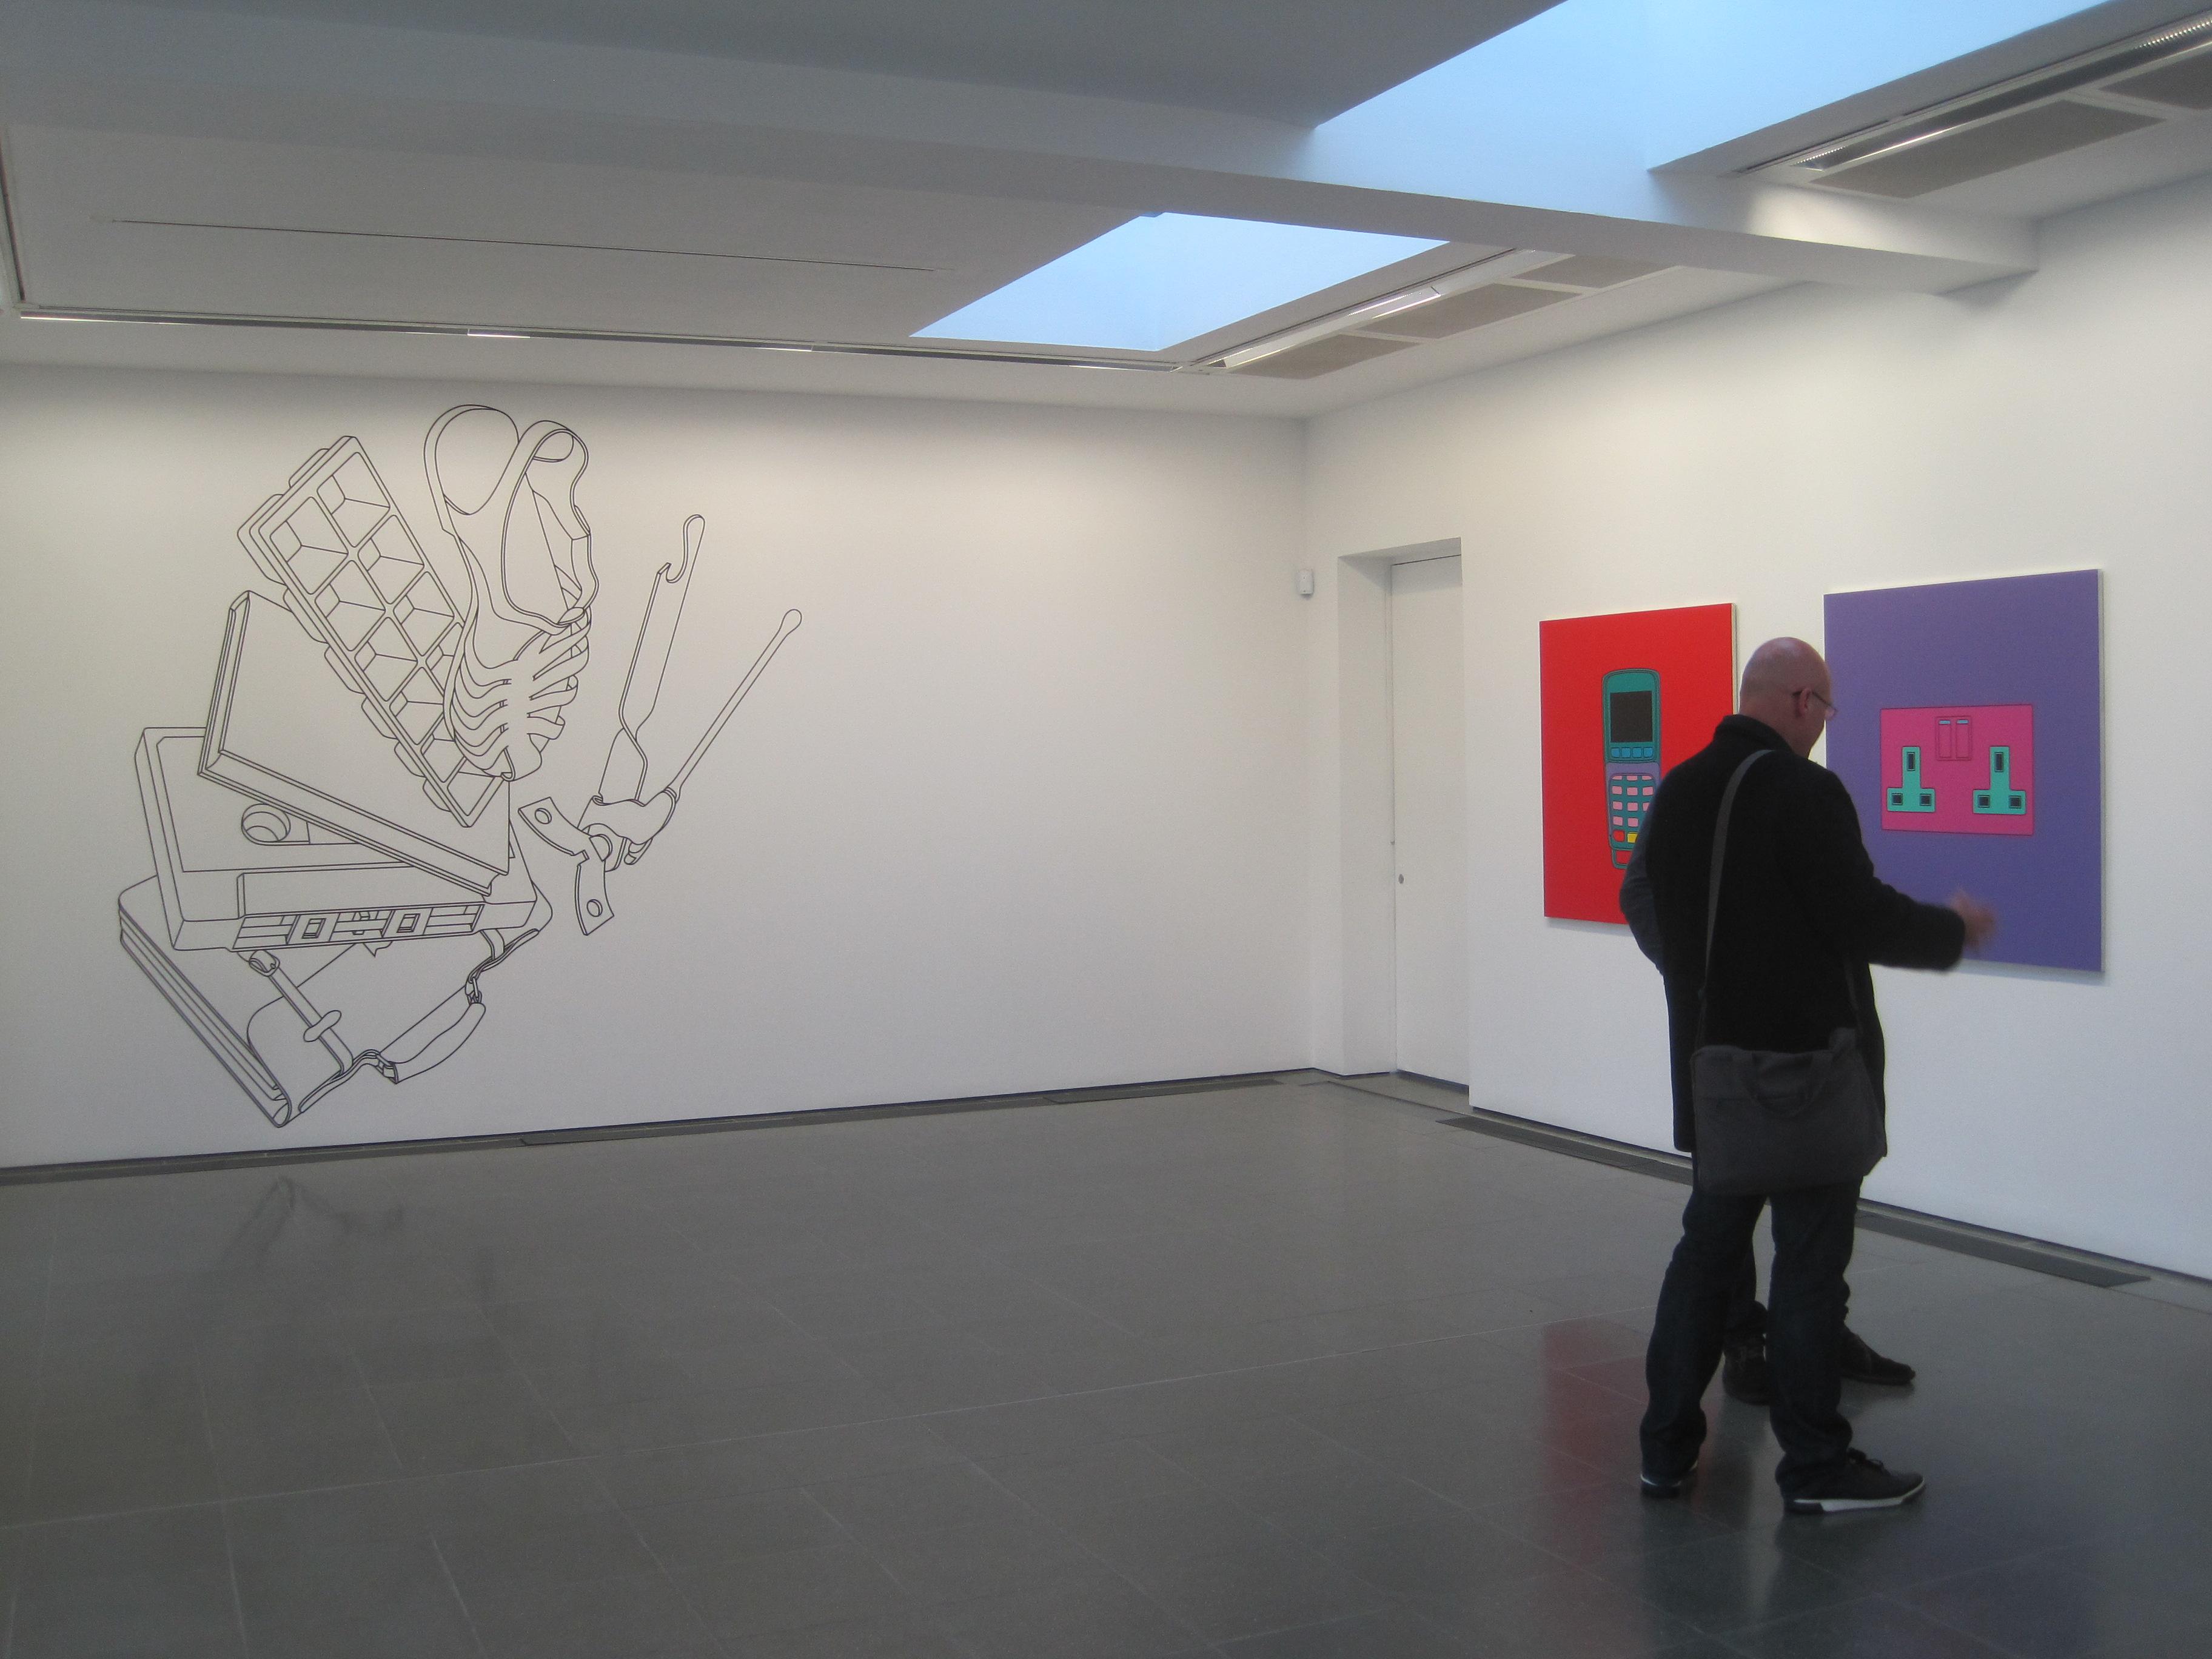 Installation View Of Vertigo By Michael Craig Martin 1981 At The Serpentine Gallery